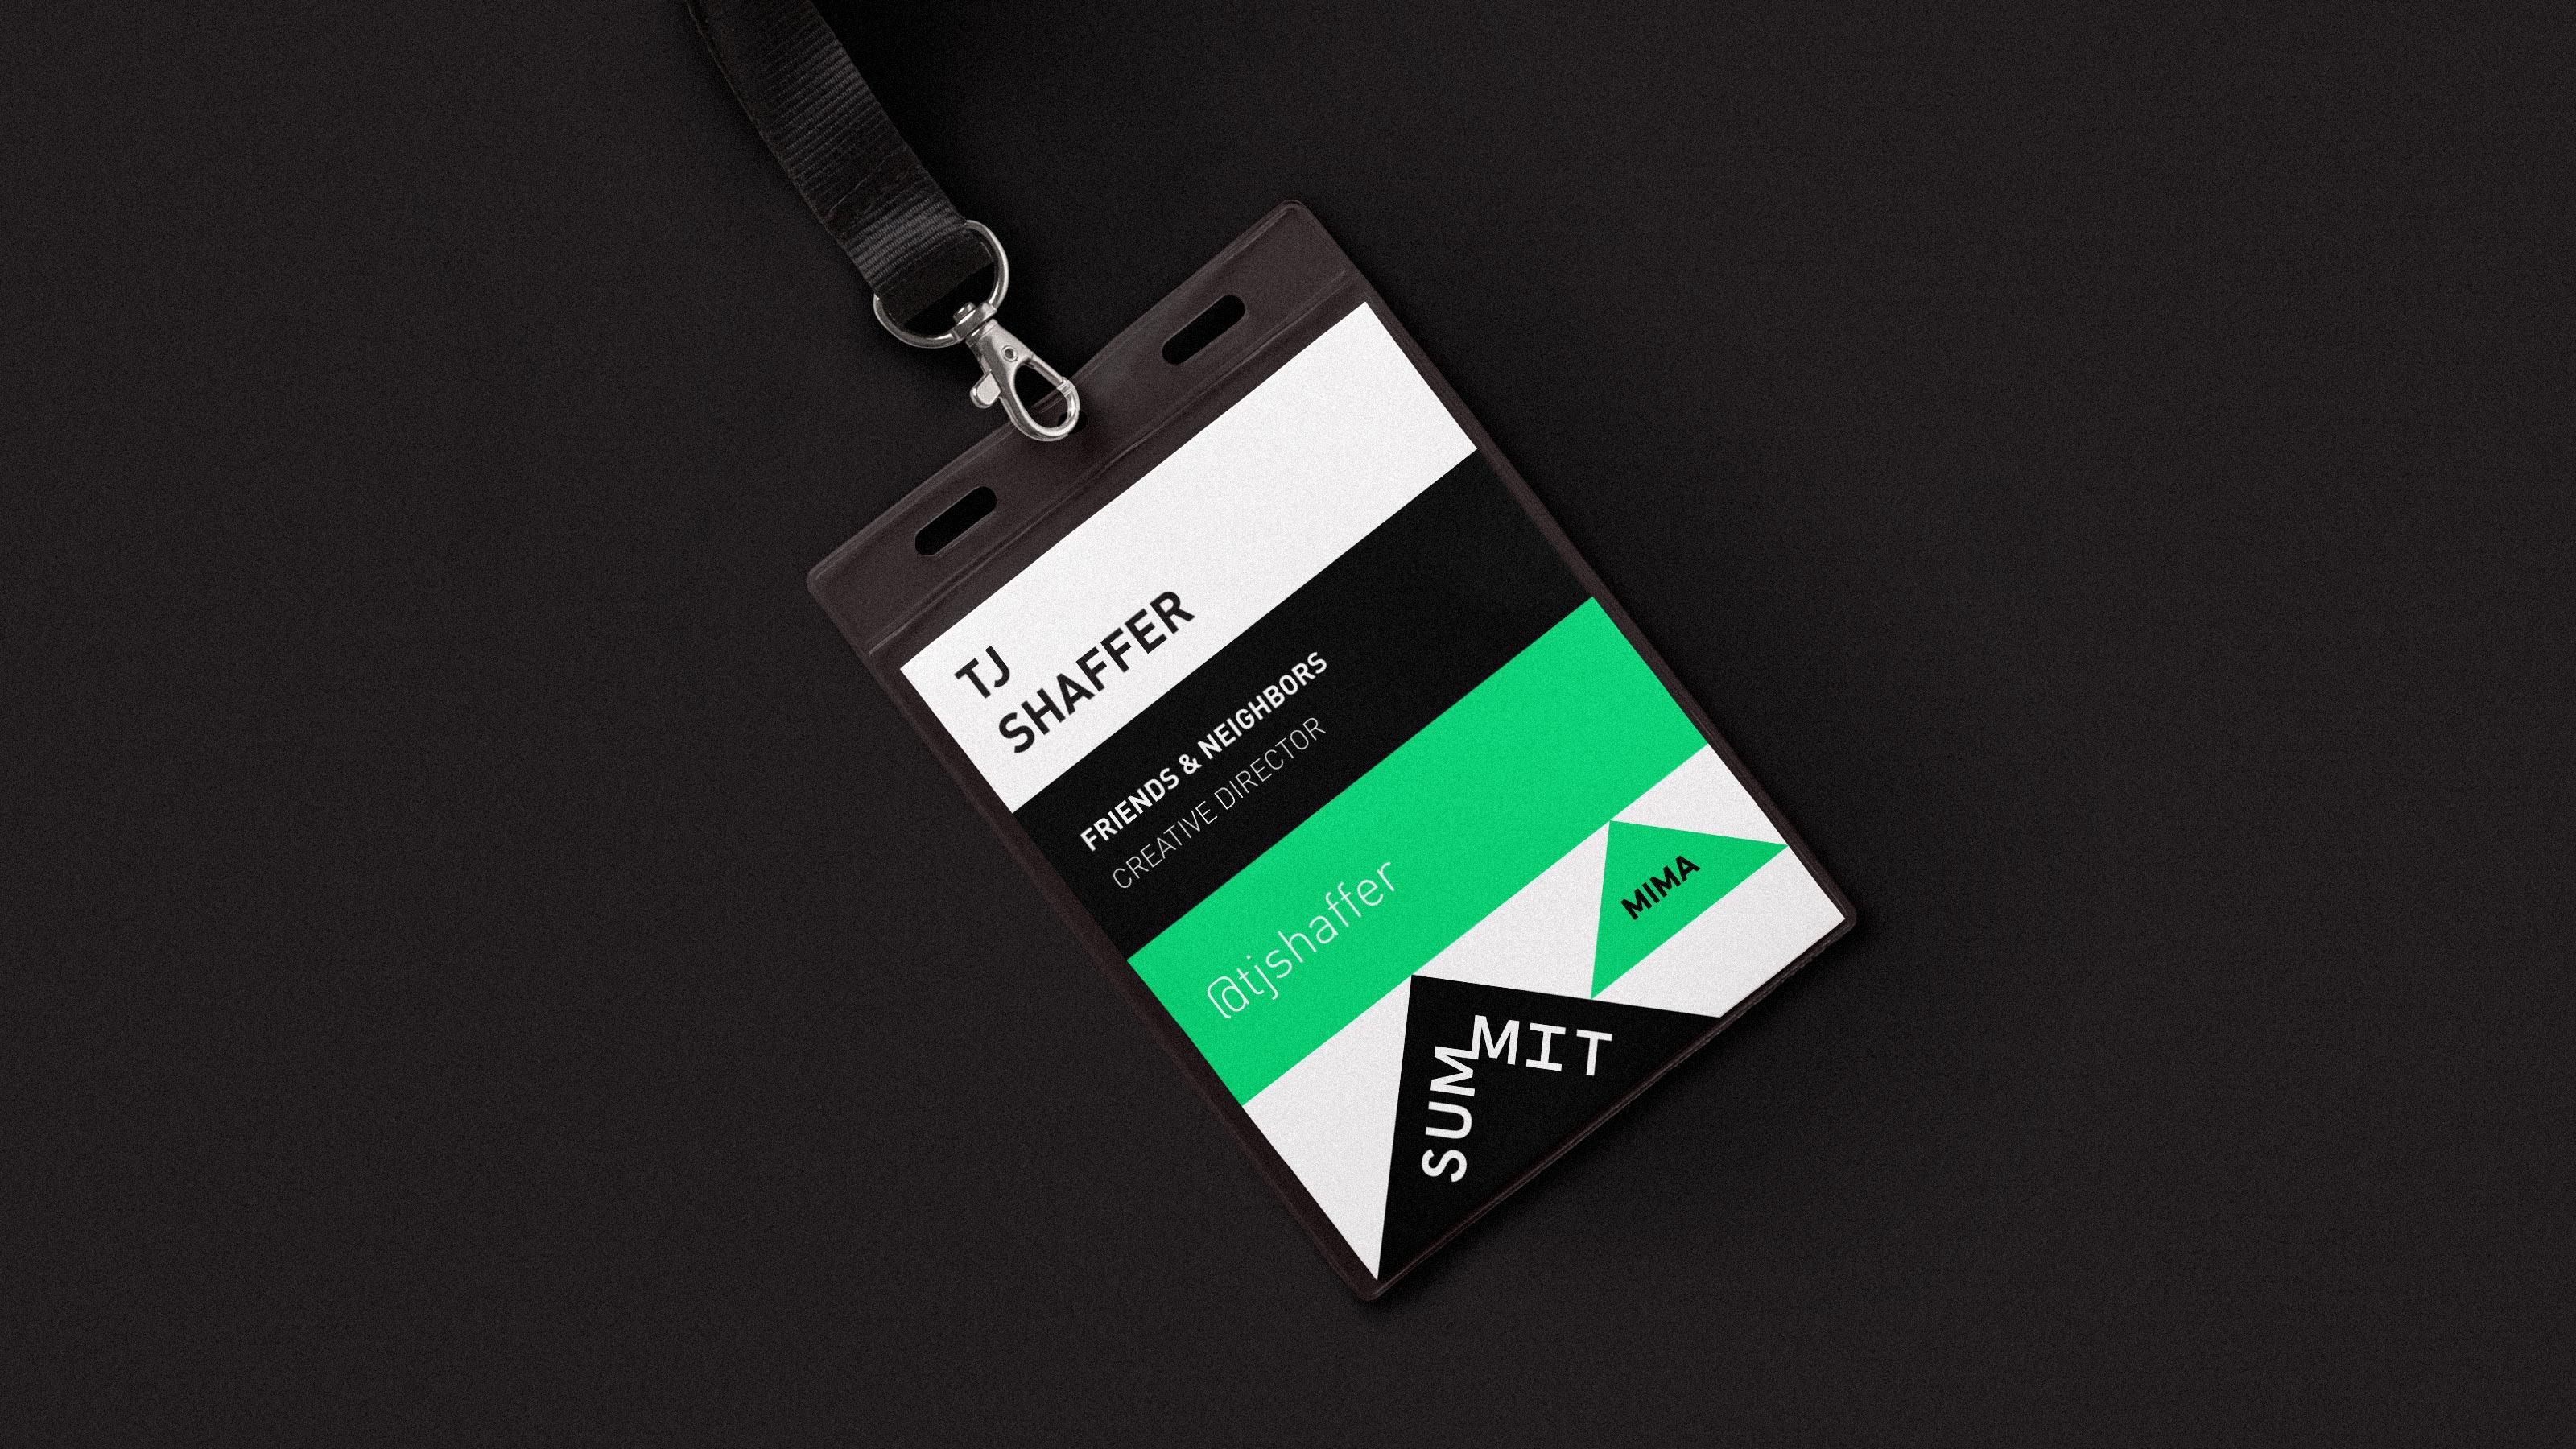 MIMA_Summit_2017_CardHolder